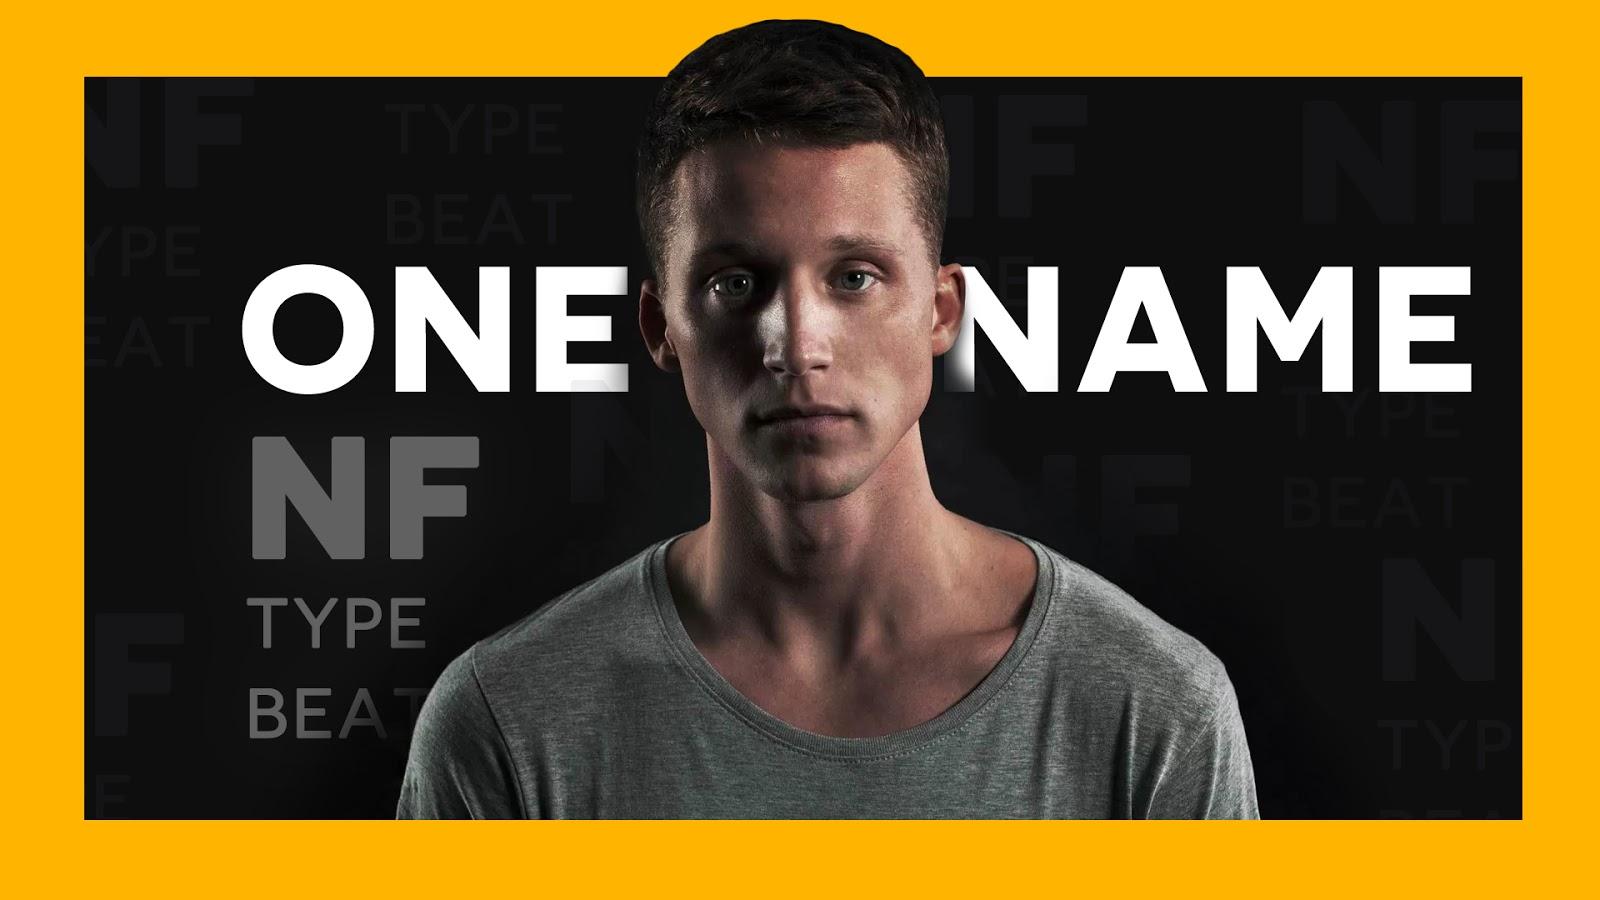 NF type Beat - One Name - Christian Hip-hop rap beat - New